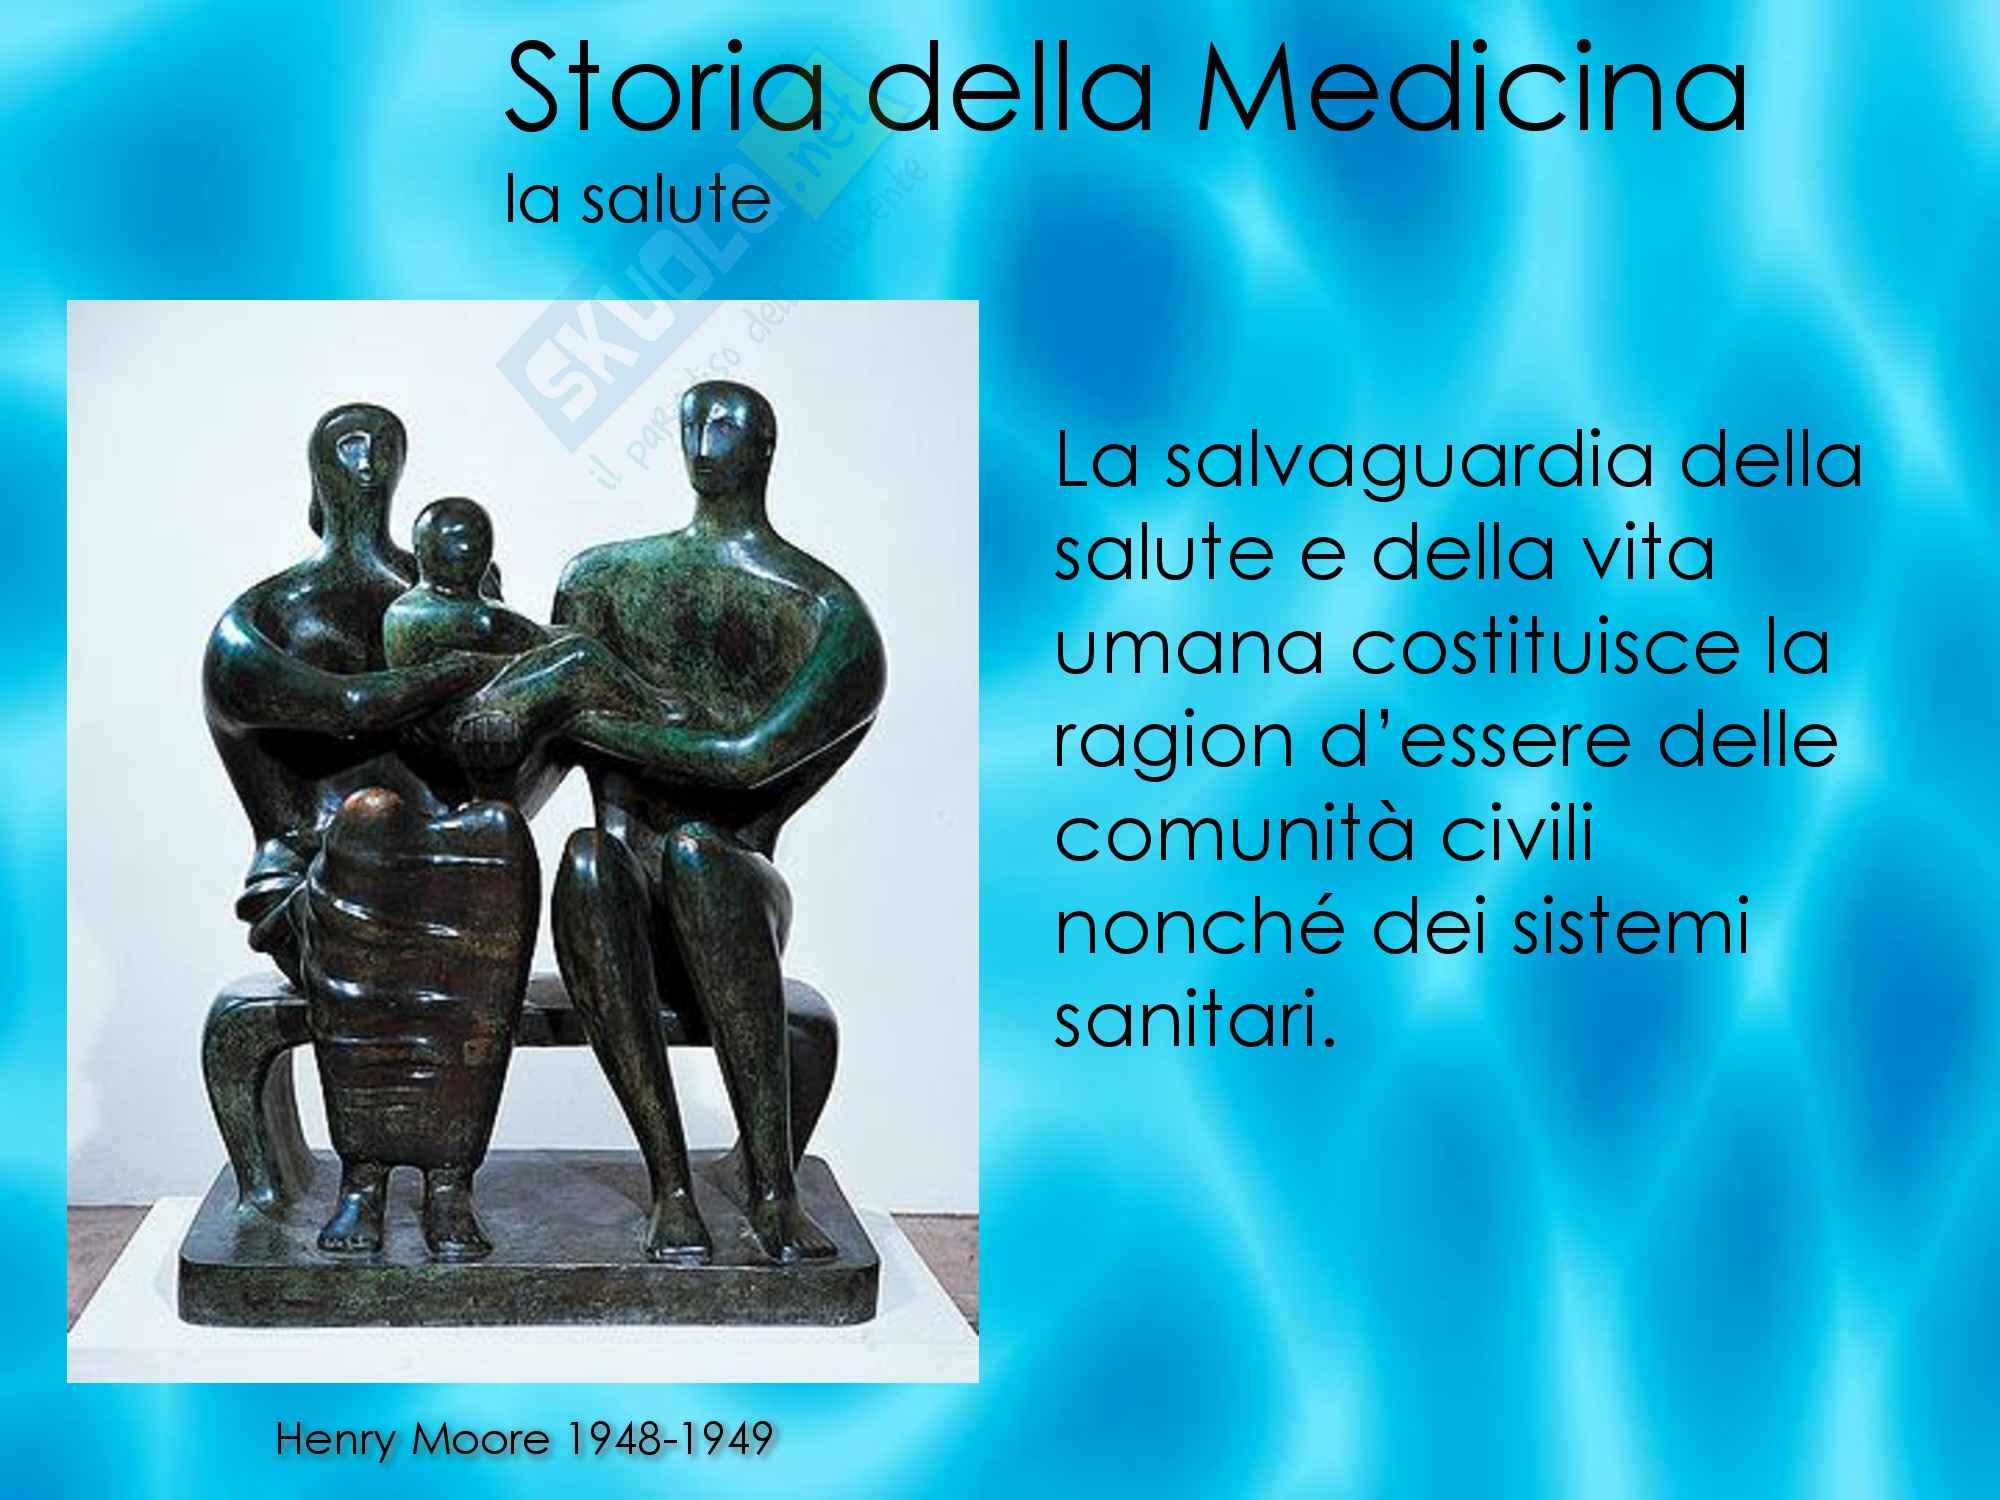 Storia della medicina - La salute